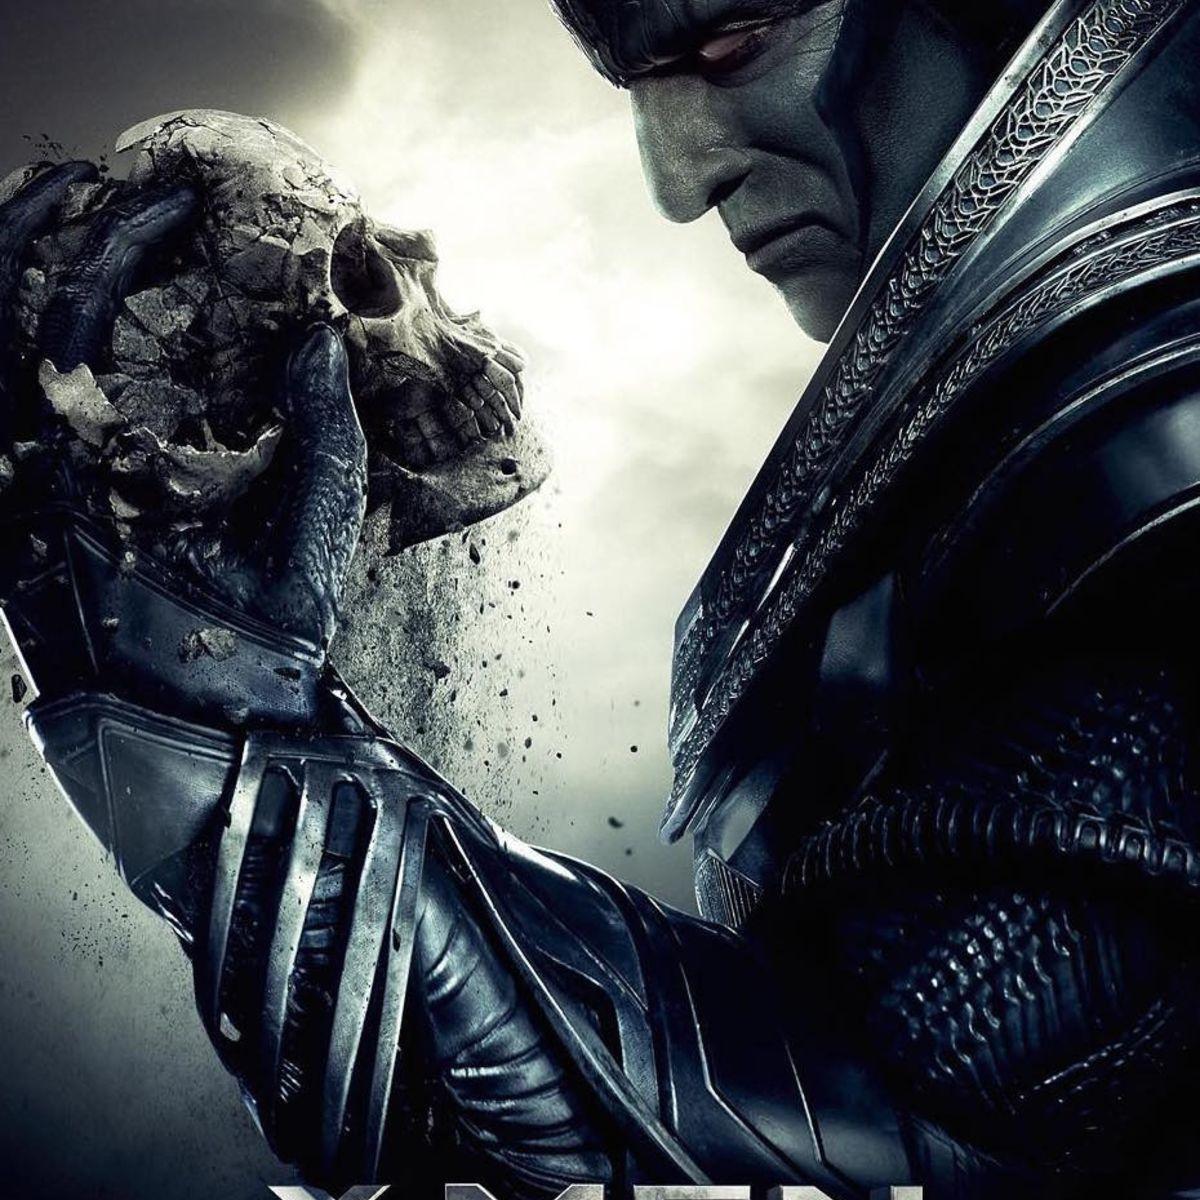 X-Men-Apocalypse-Poster-3-Oscar-Isaac.jpg